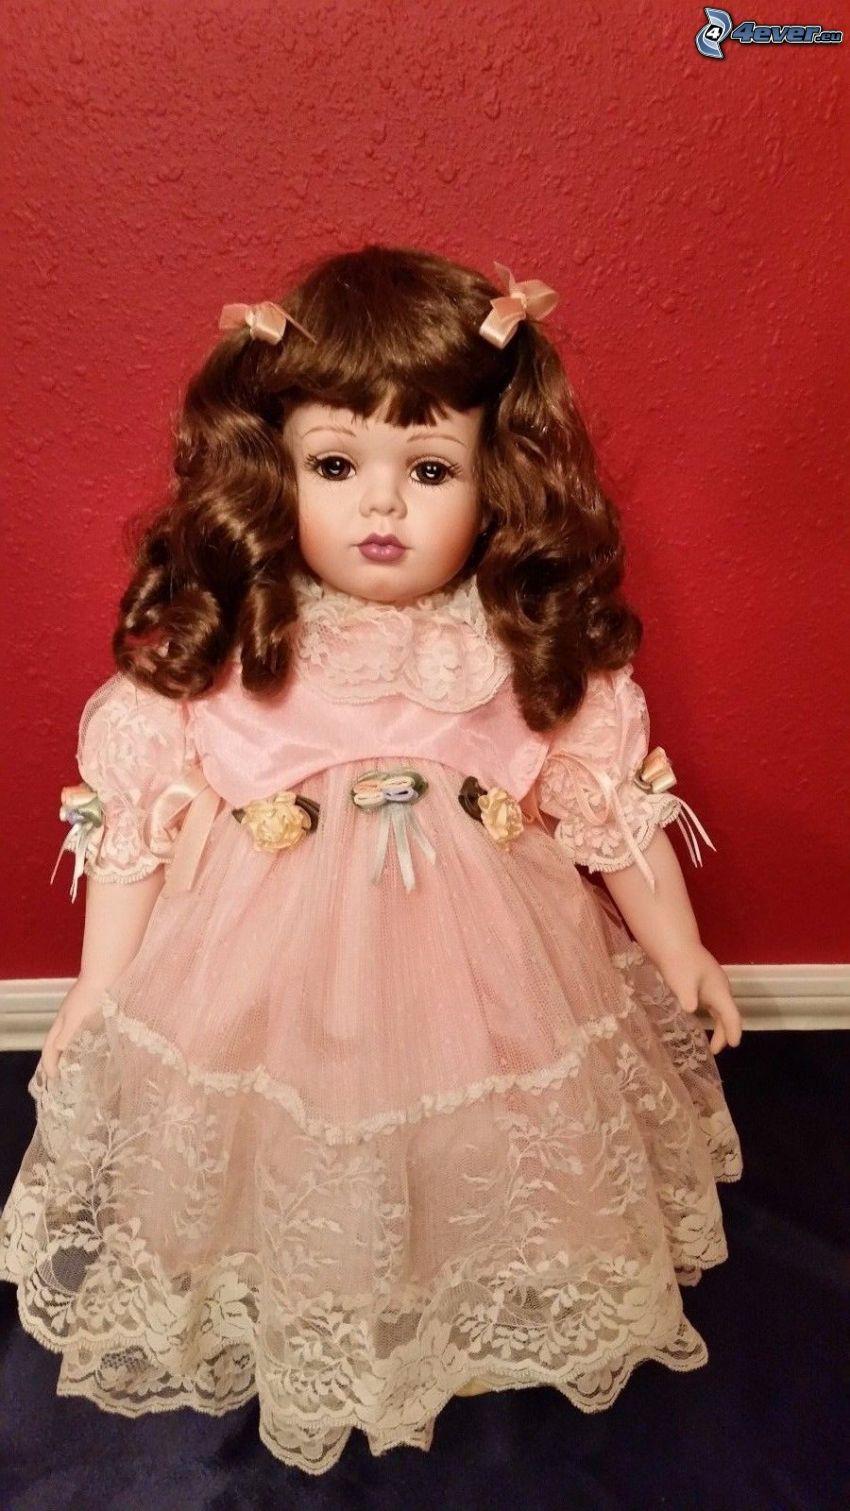 Porzellanpuppe, rosa Kleid